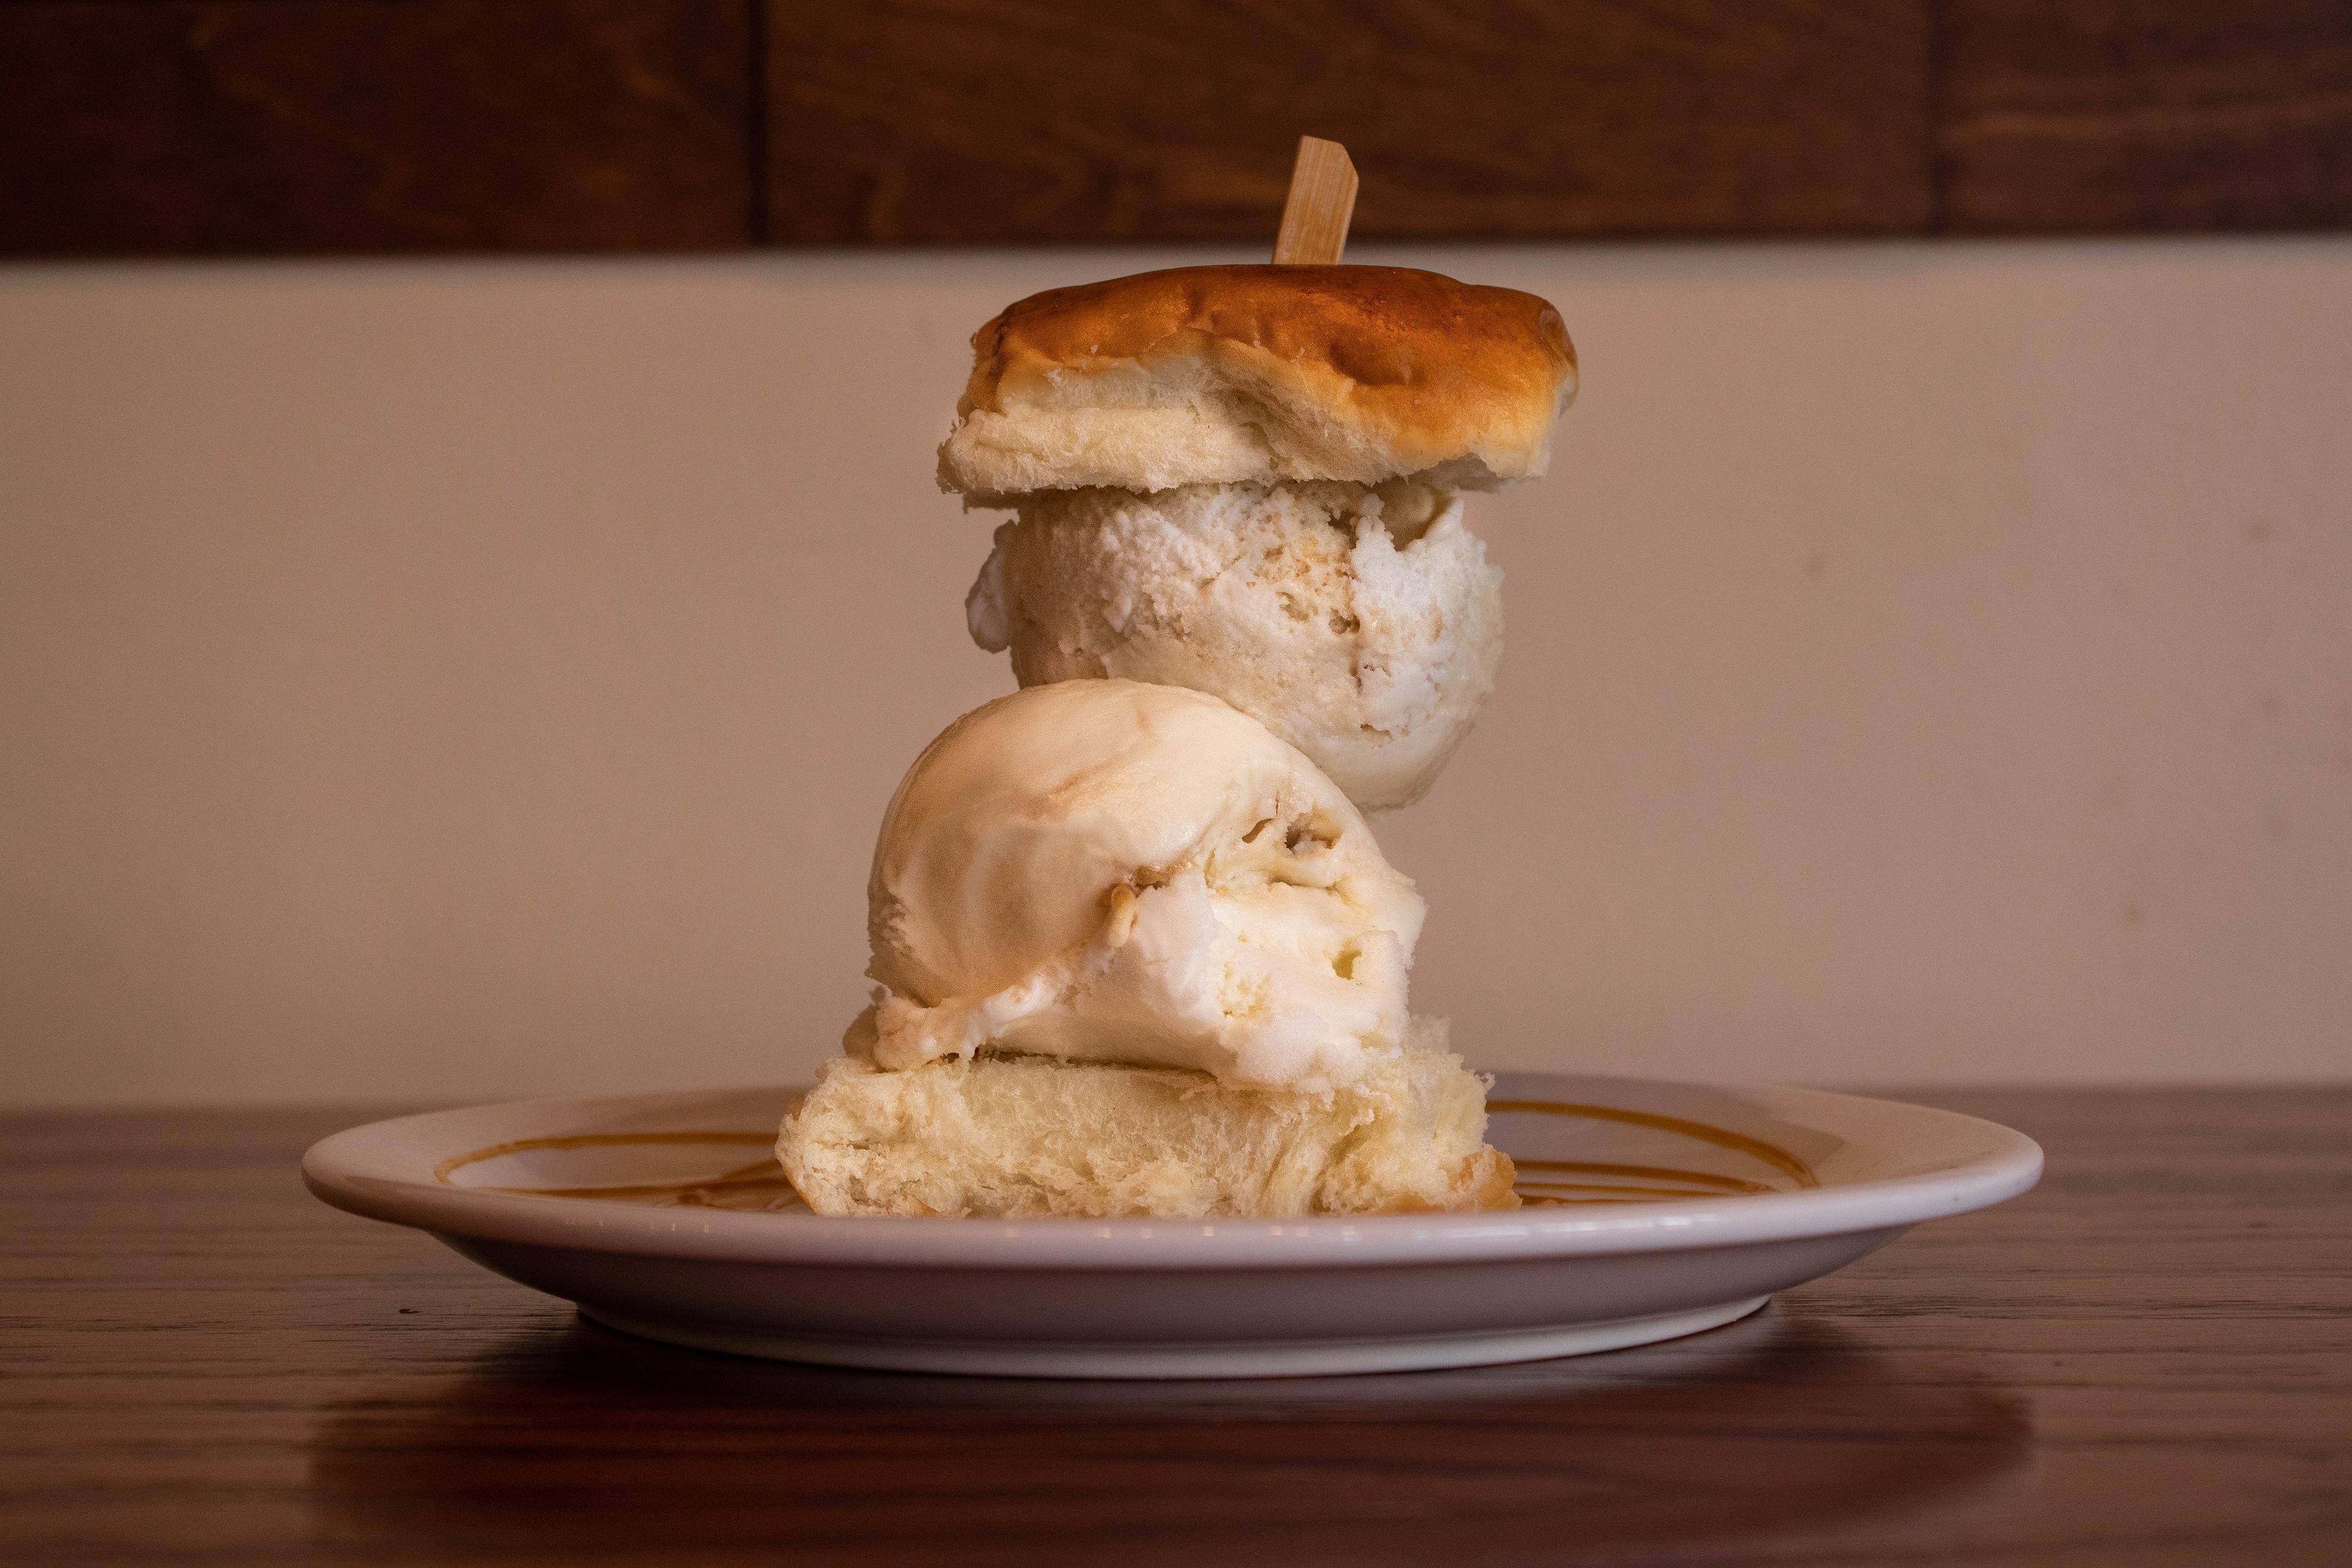 000000_Ice Cream Sandwich_MJ.jpg